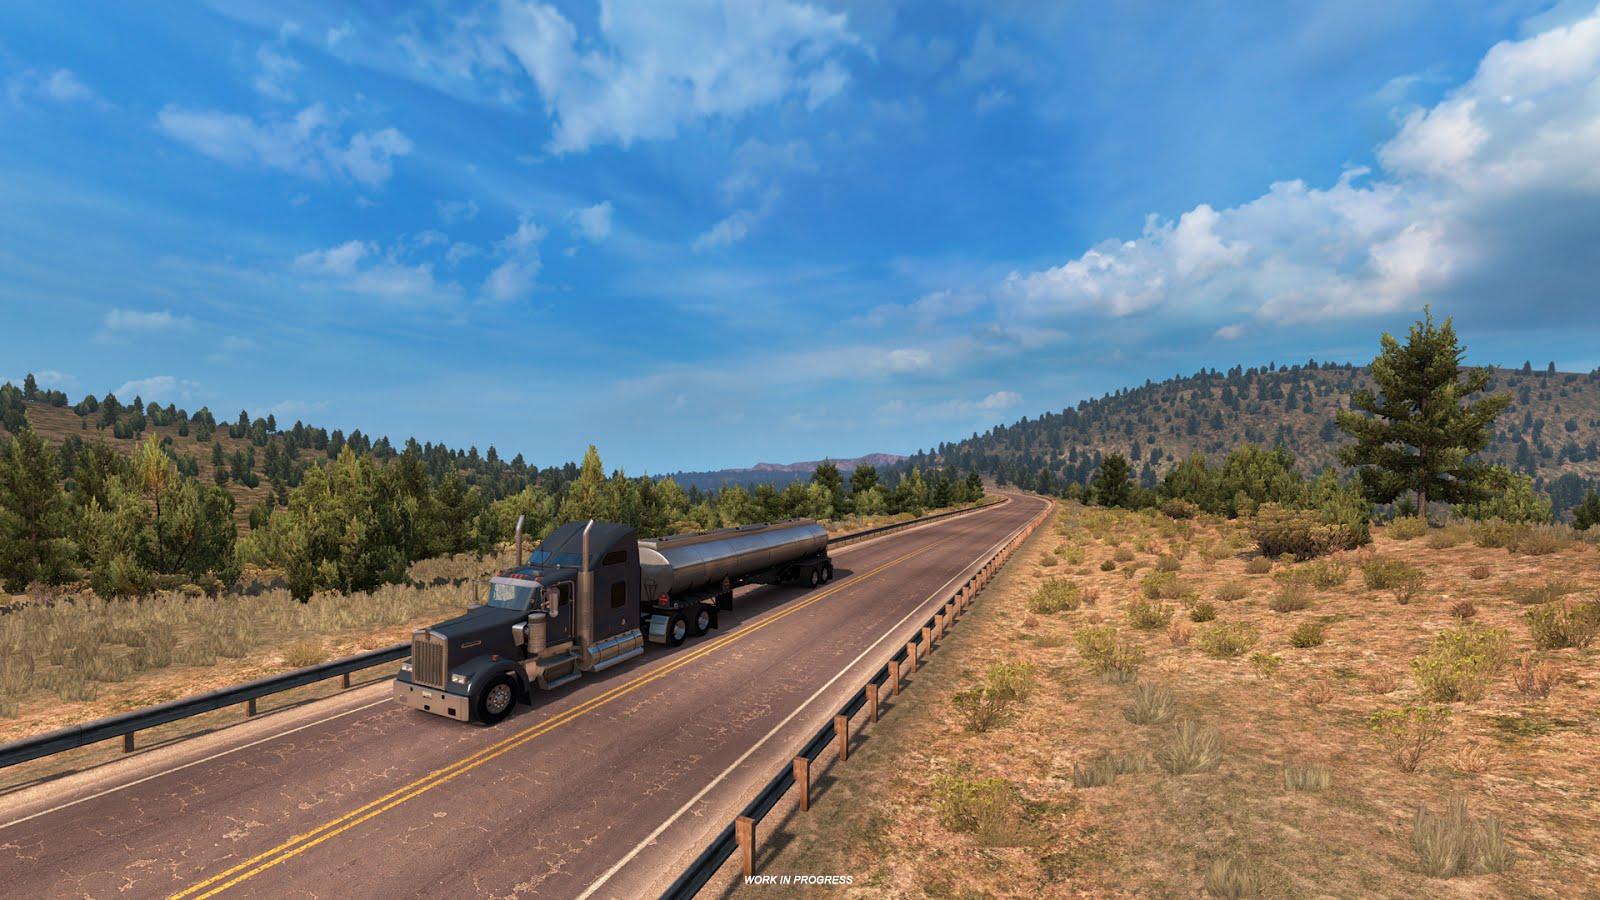 Takhle bude změněna mapa American Truck Simulatoru 128350